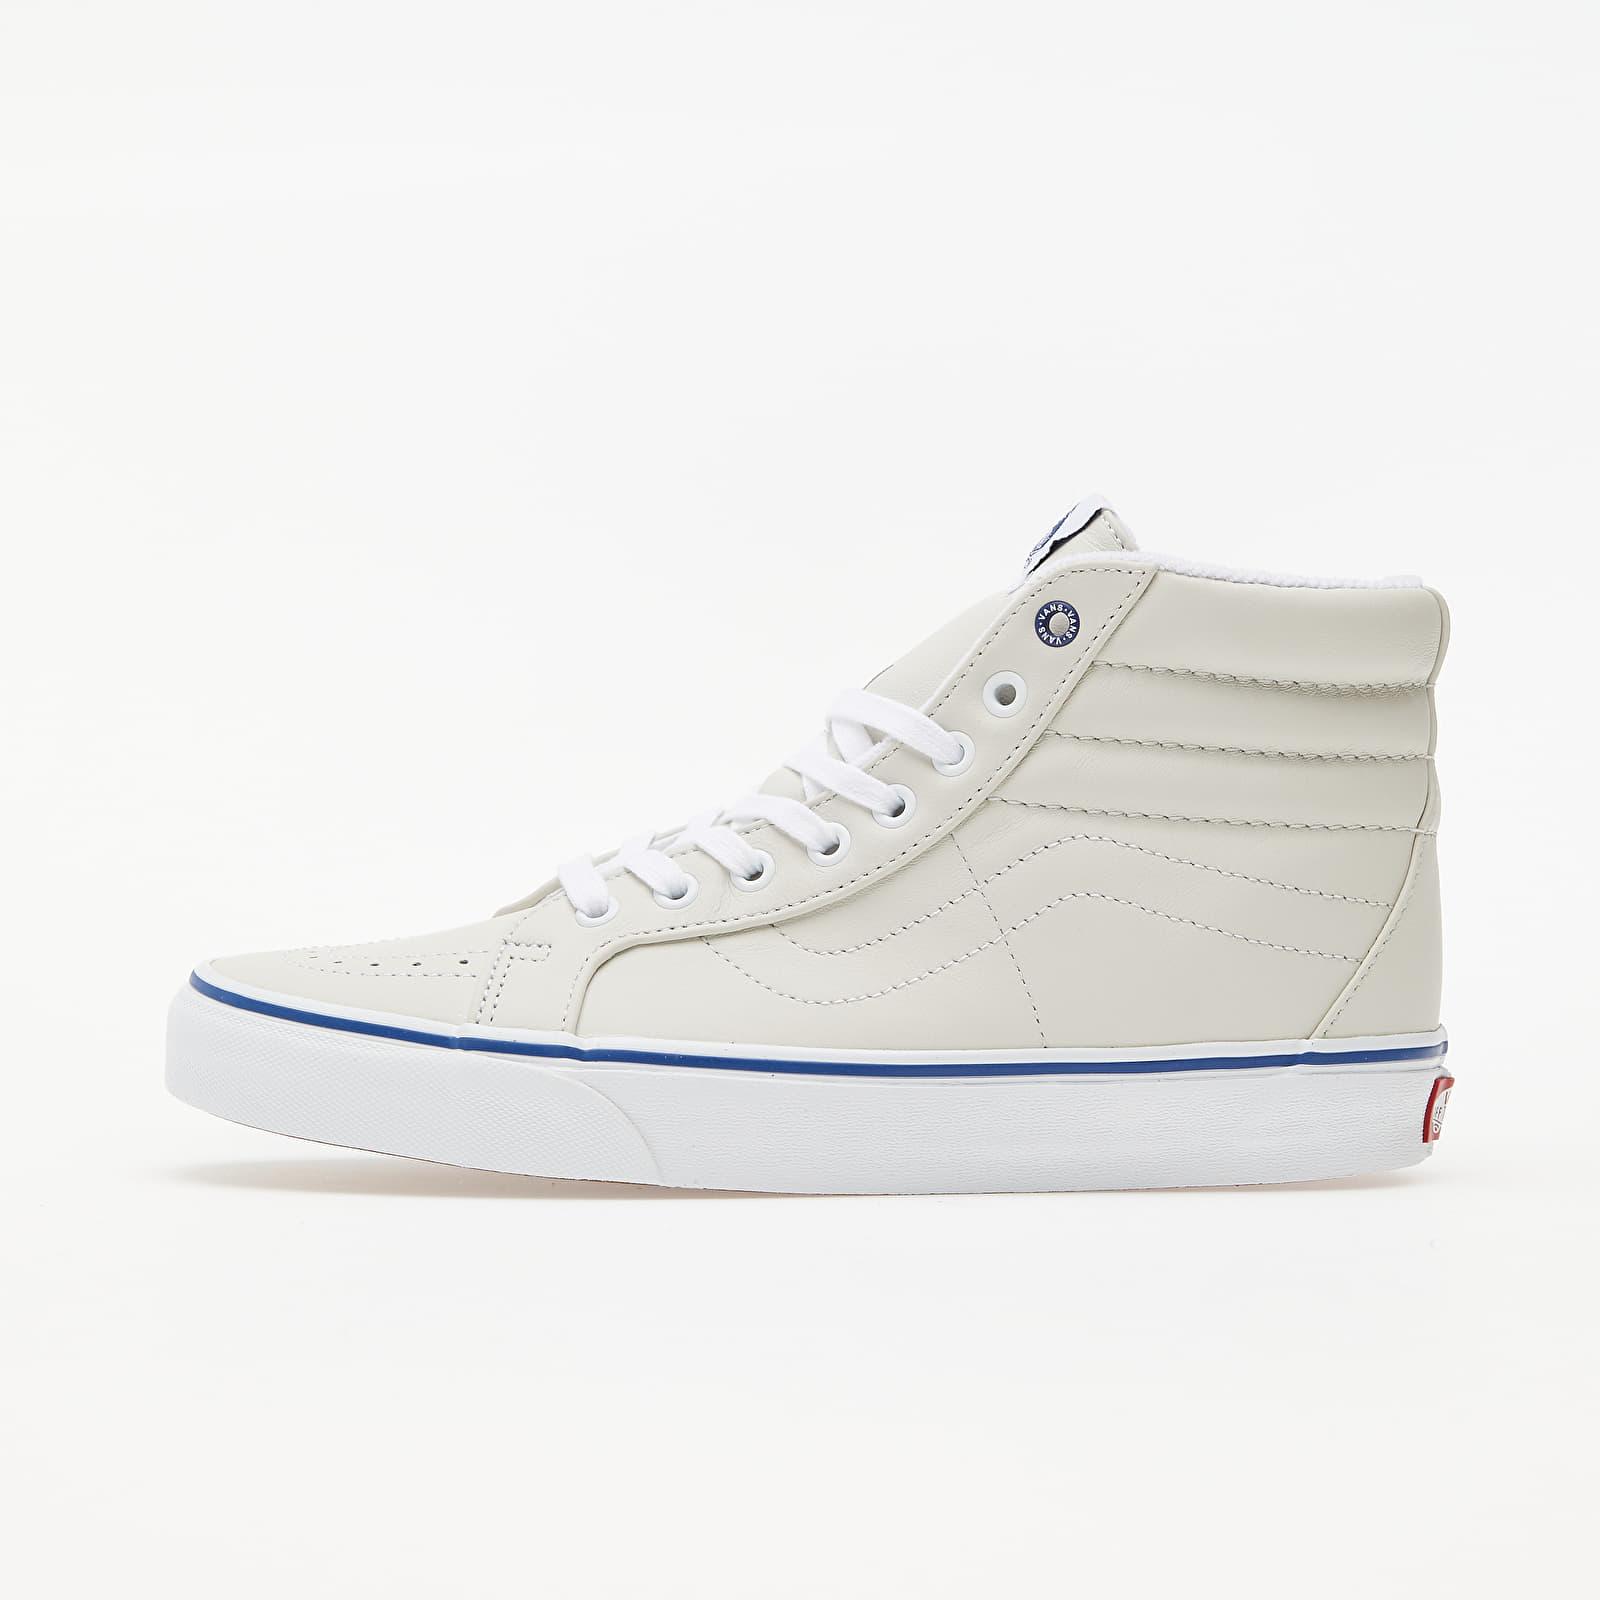 Vans Sk8-Hi Reissue (Butter Leather) True White/ Limoges EUR 46